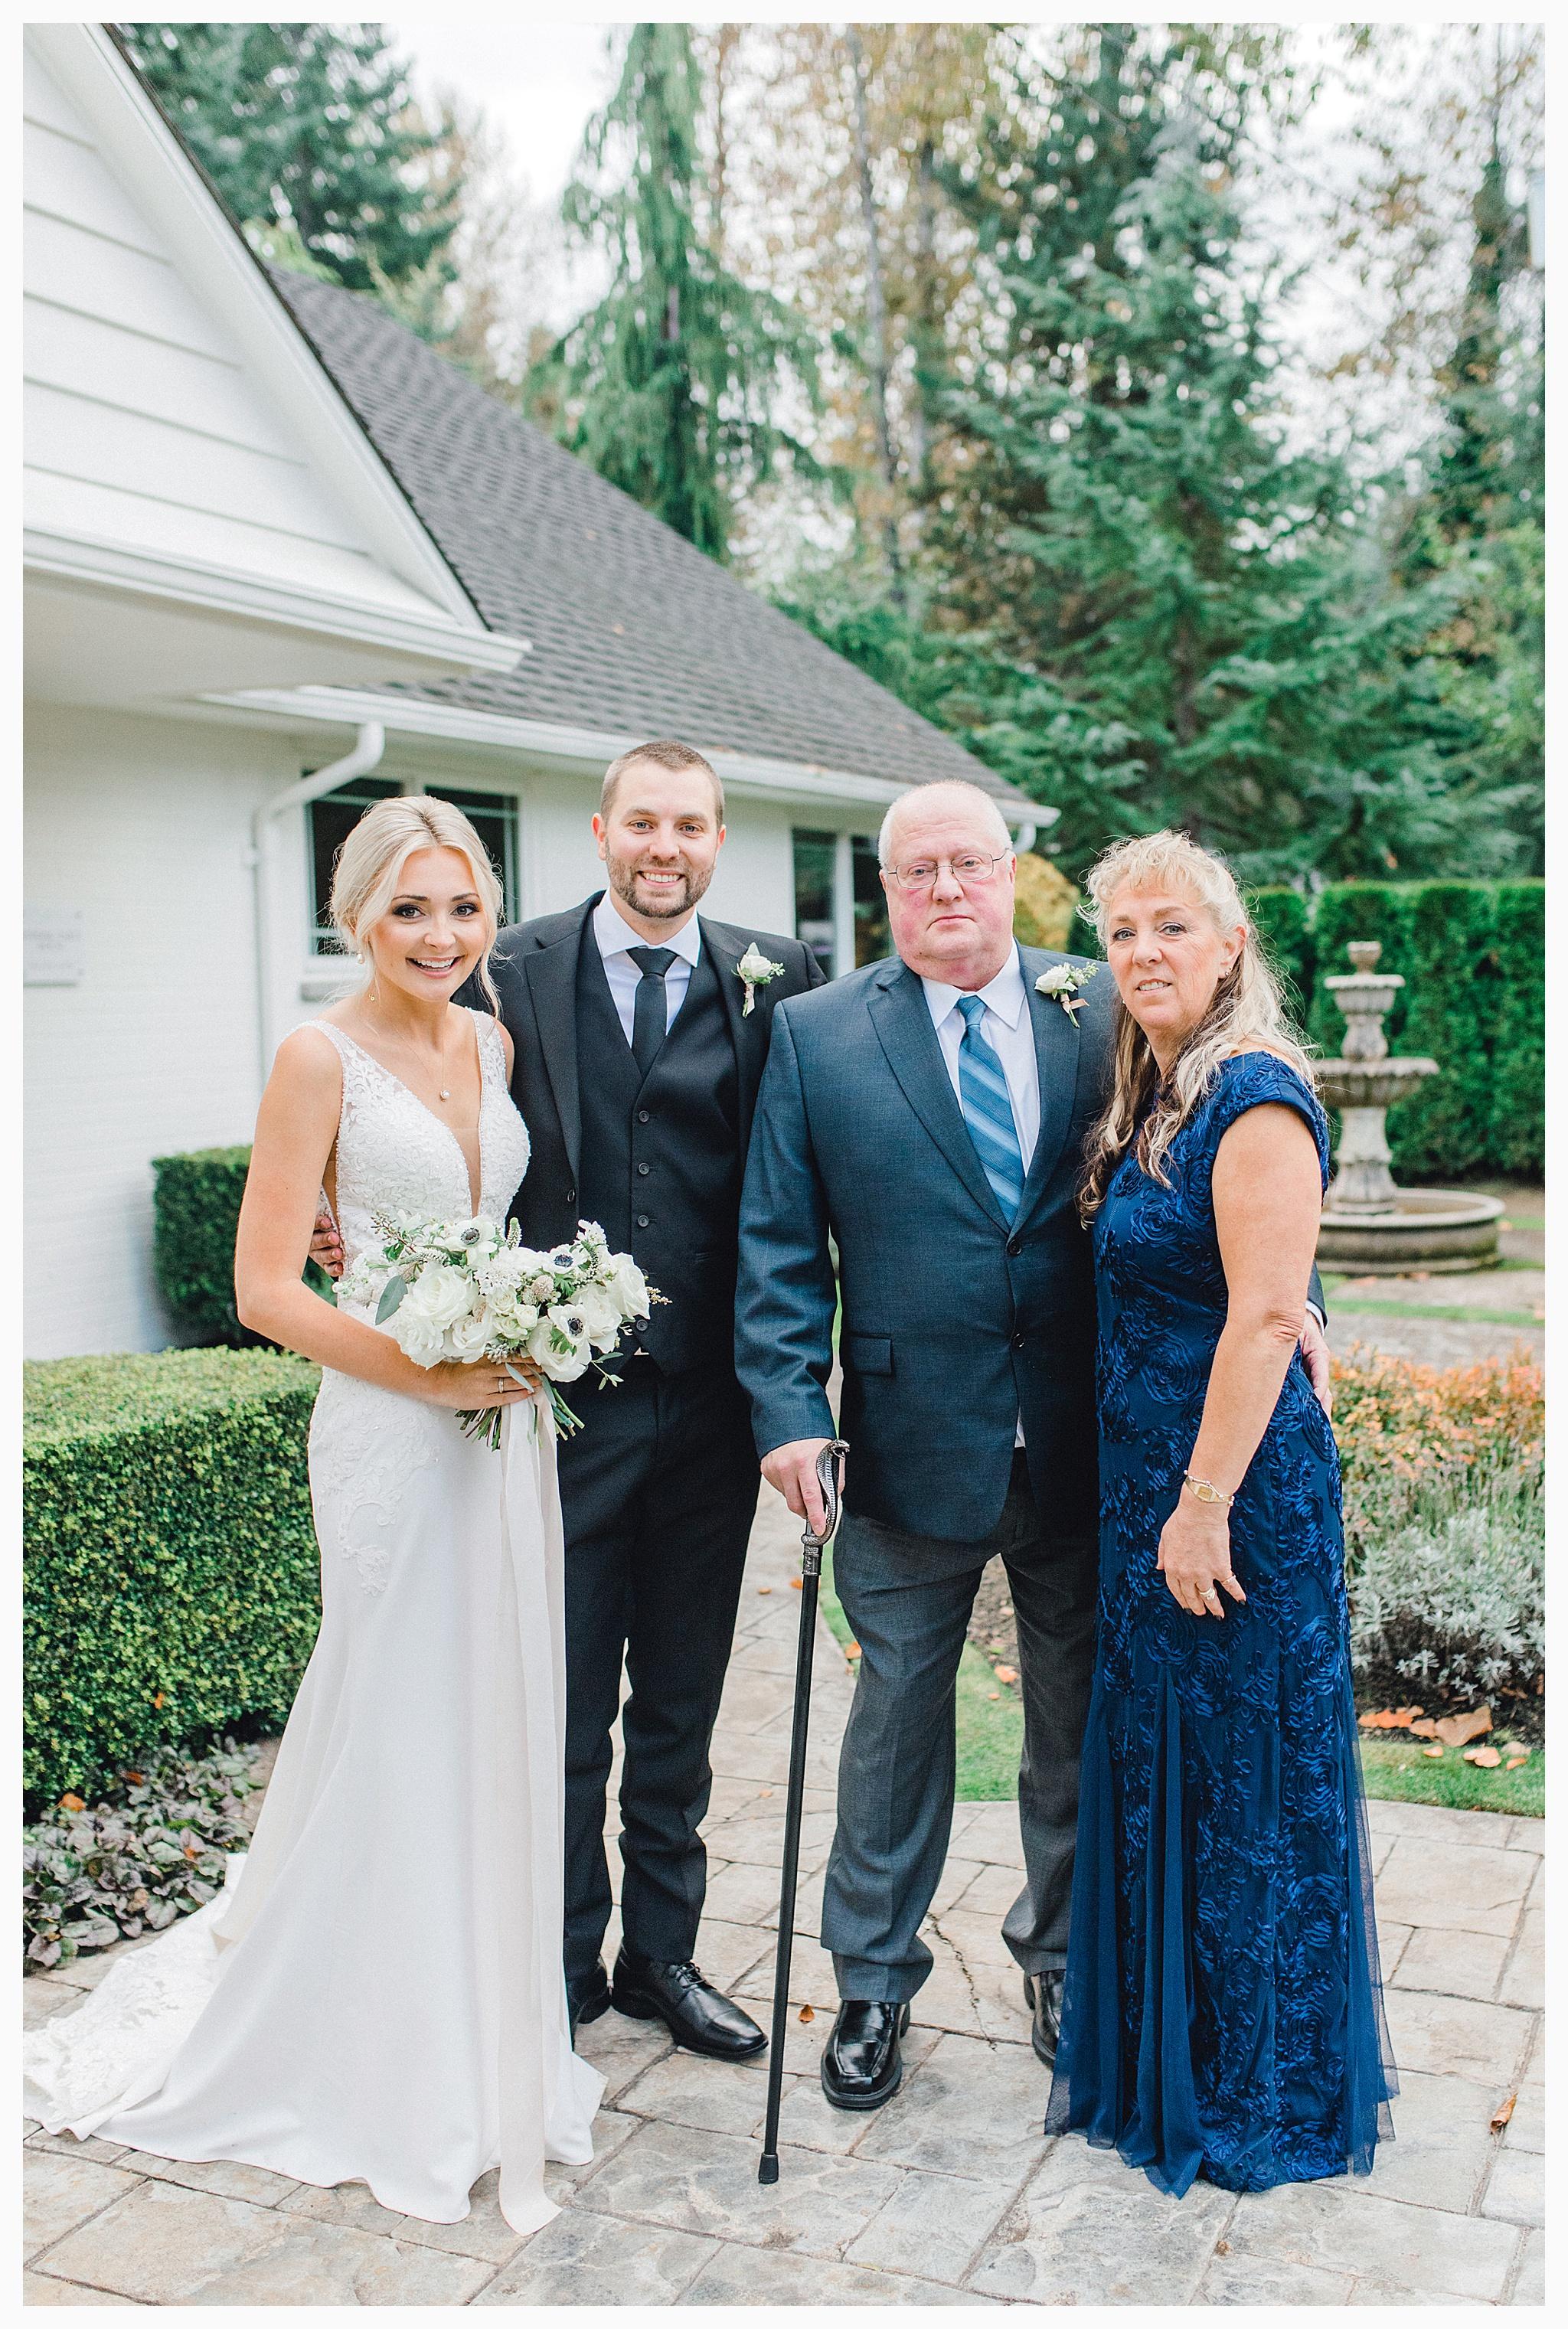 Emma Rose Company Light and Airy Wedding Photographer, Beautiful fall wedding at Rock Creek Gardens Venue in Puyallup, Washington._0063.jpg